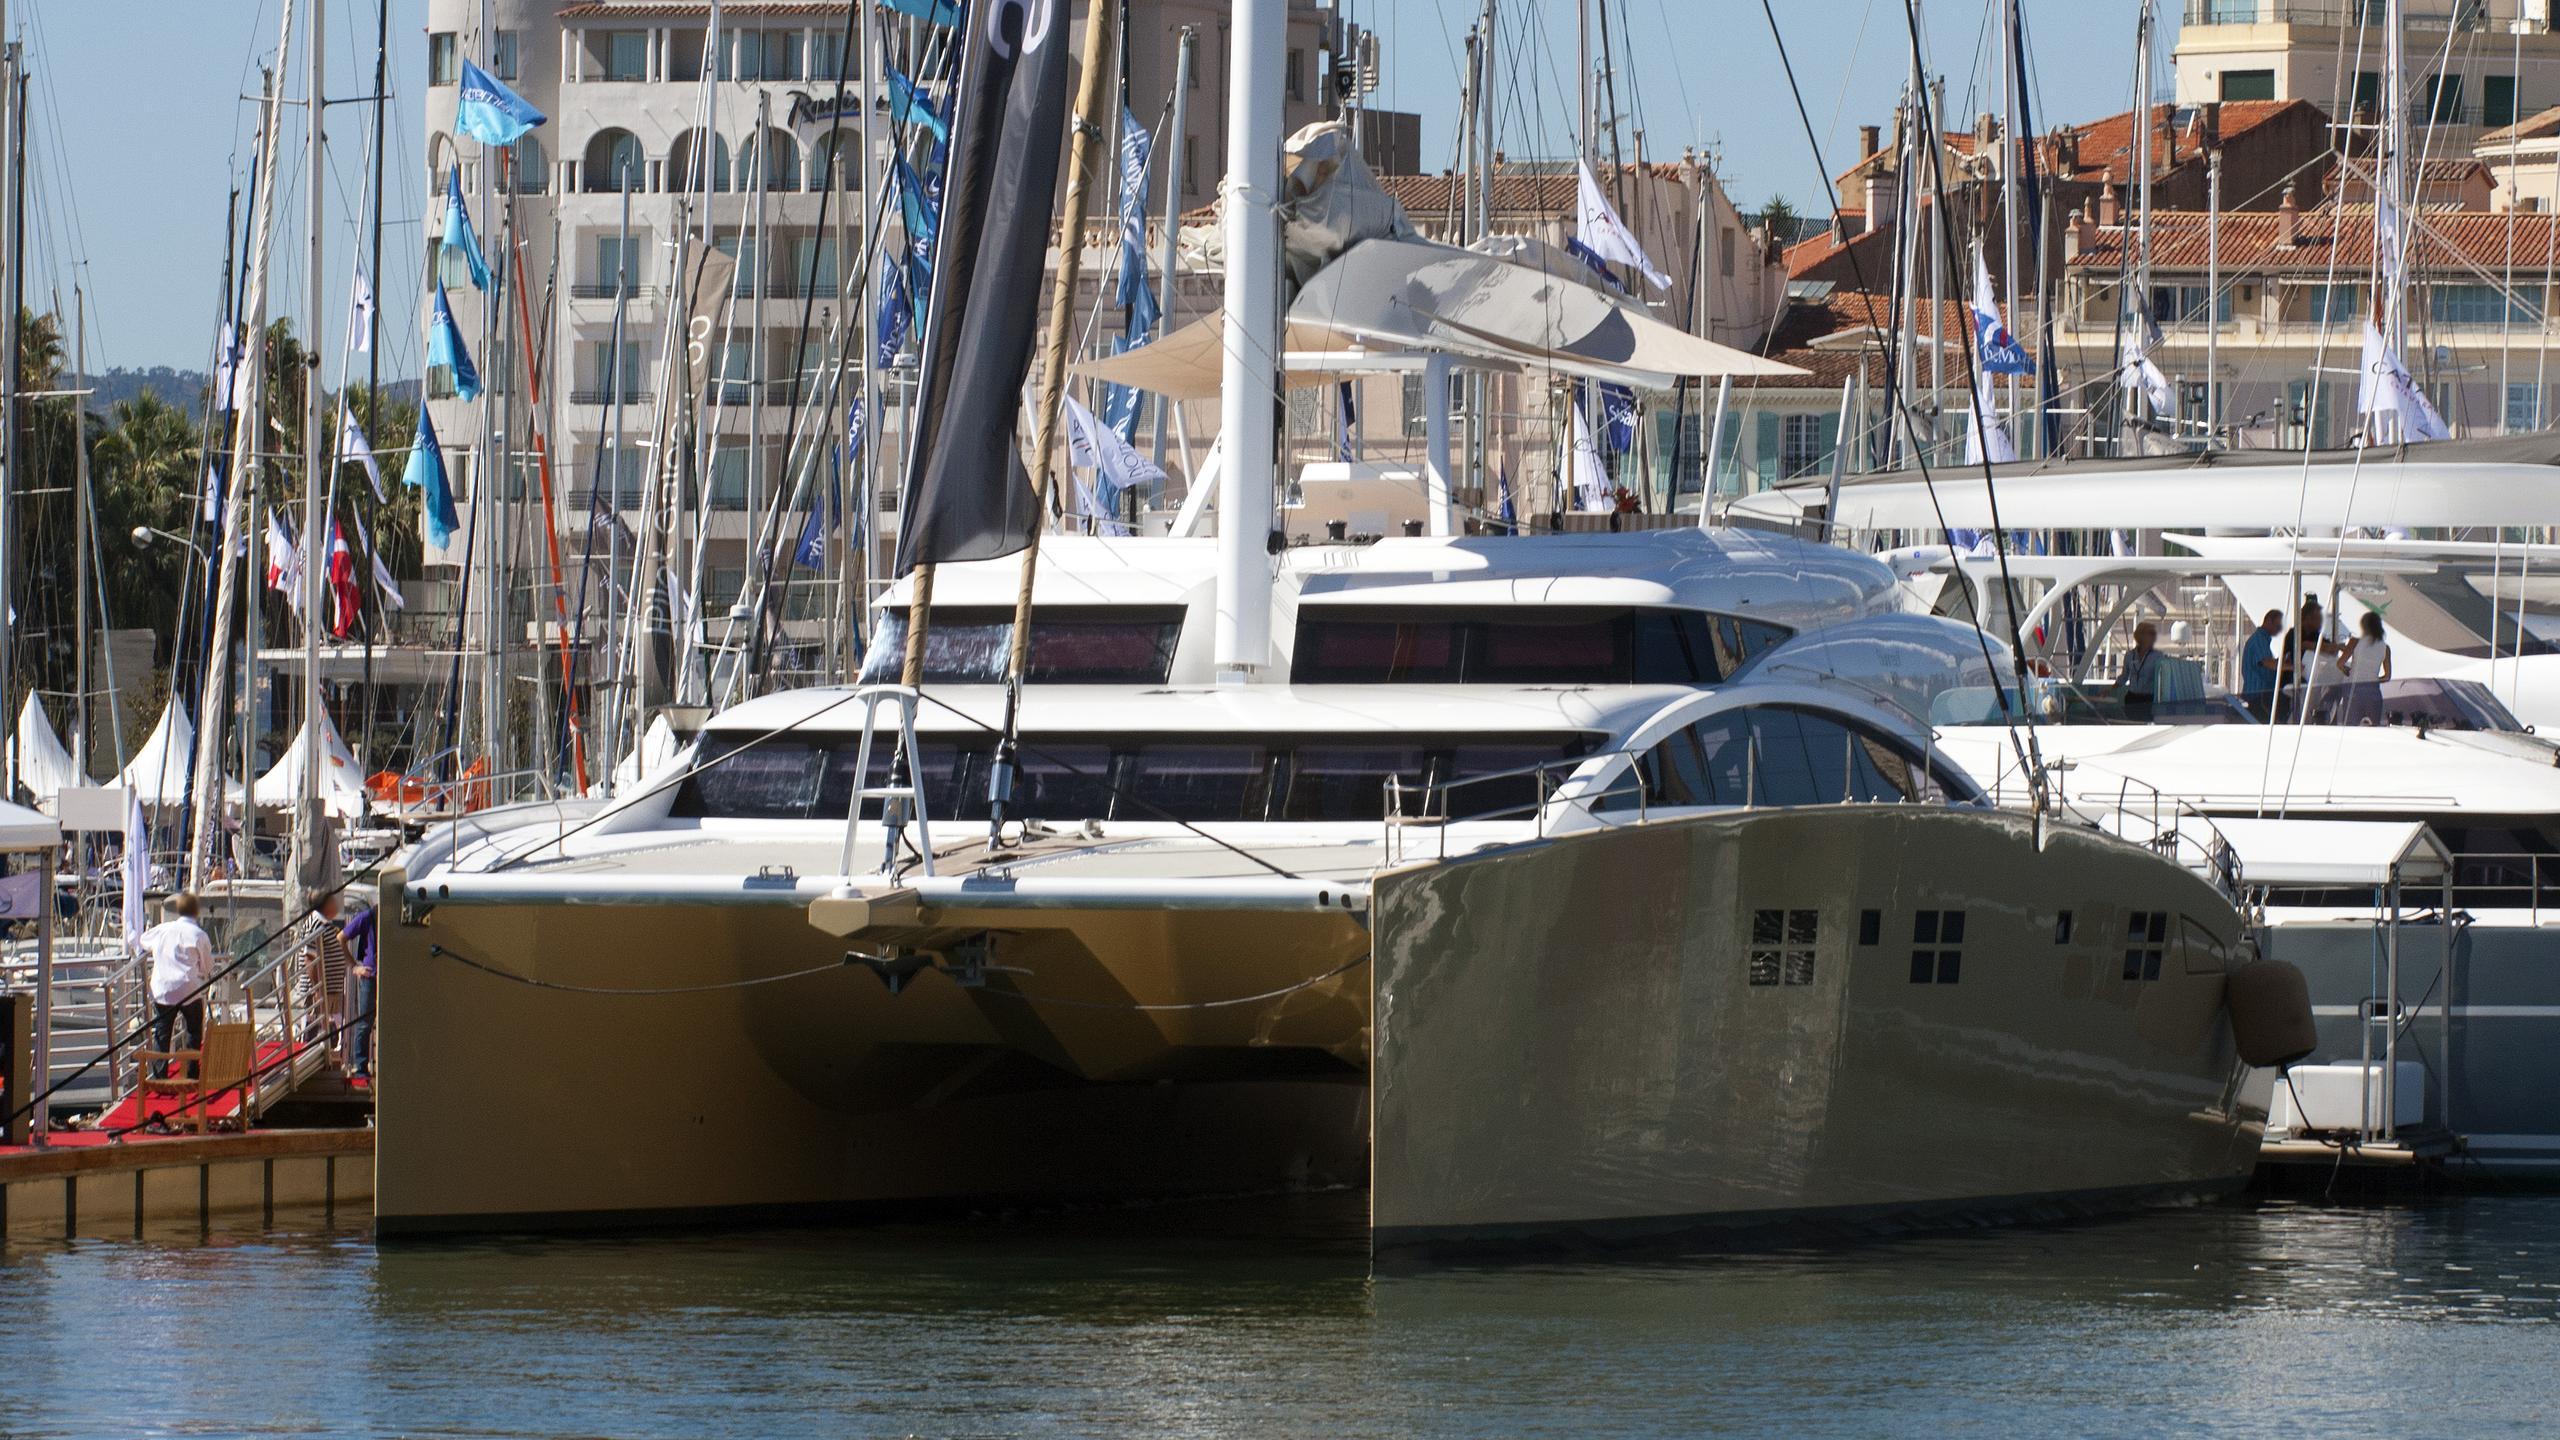 houbara-sailing-catamaran-yacht-sunreef-82-dd-2012-24m-bow